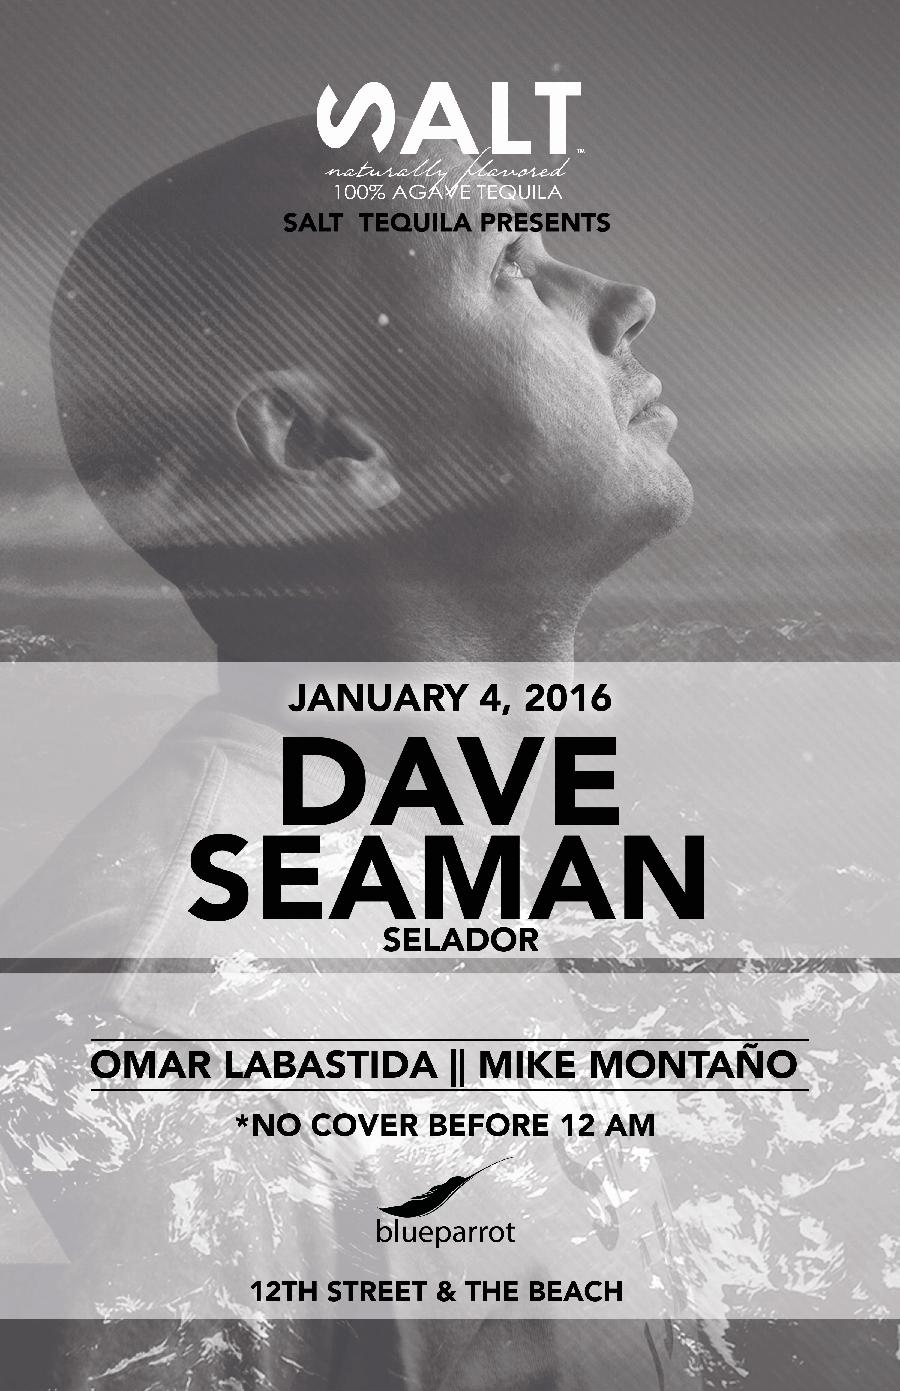 Dave Seaman @ Blue Parrot - Playa del Carmen 2016